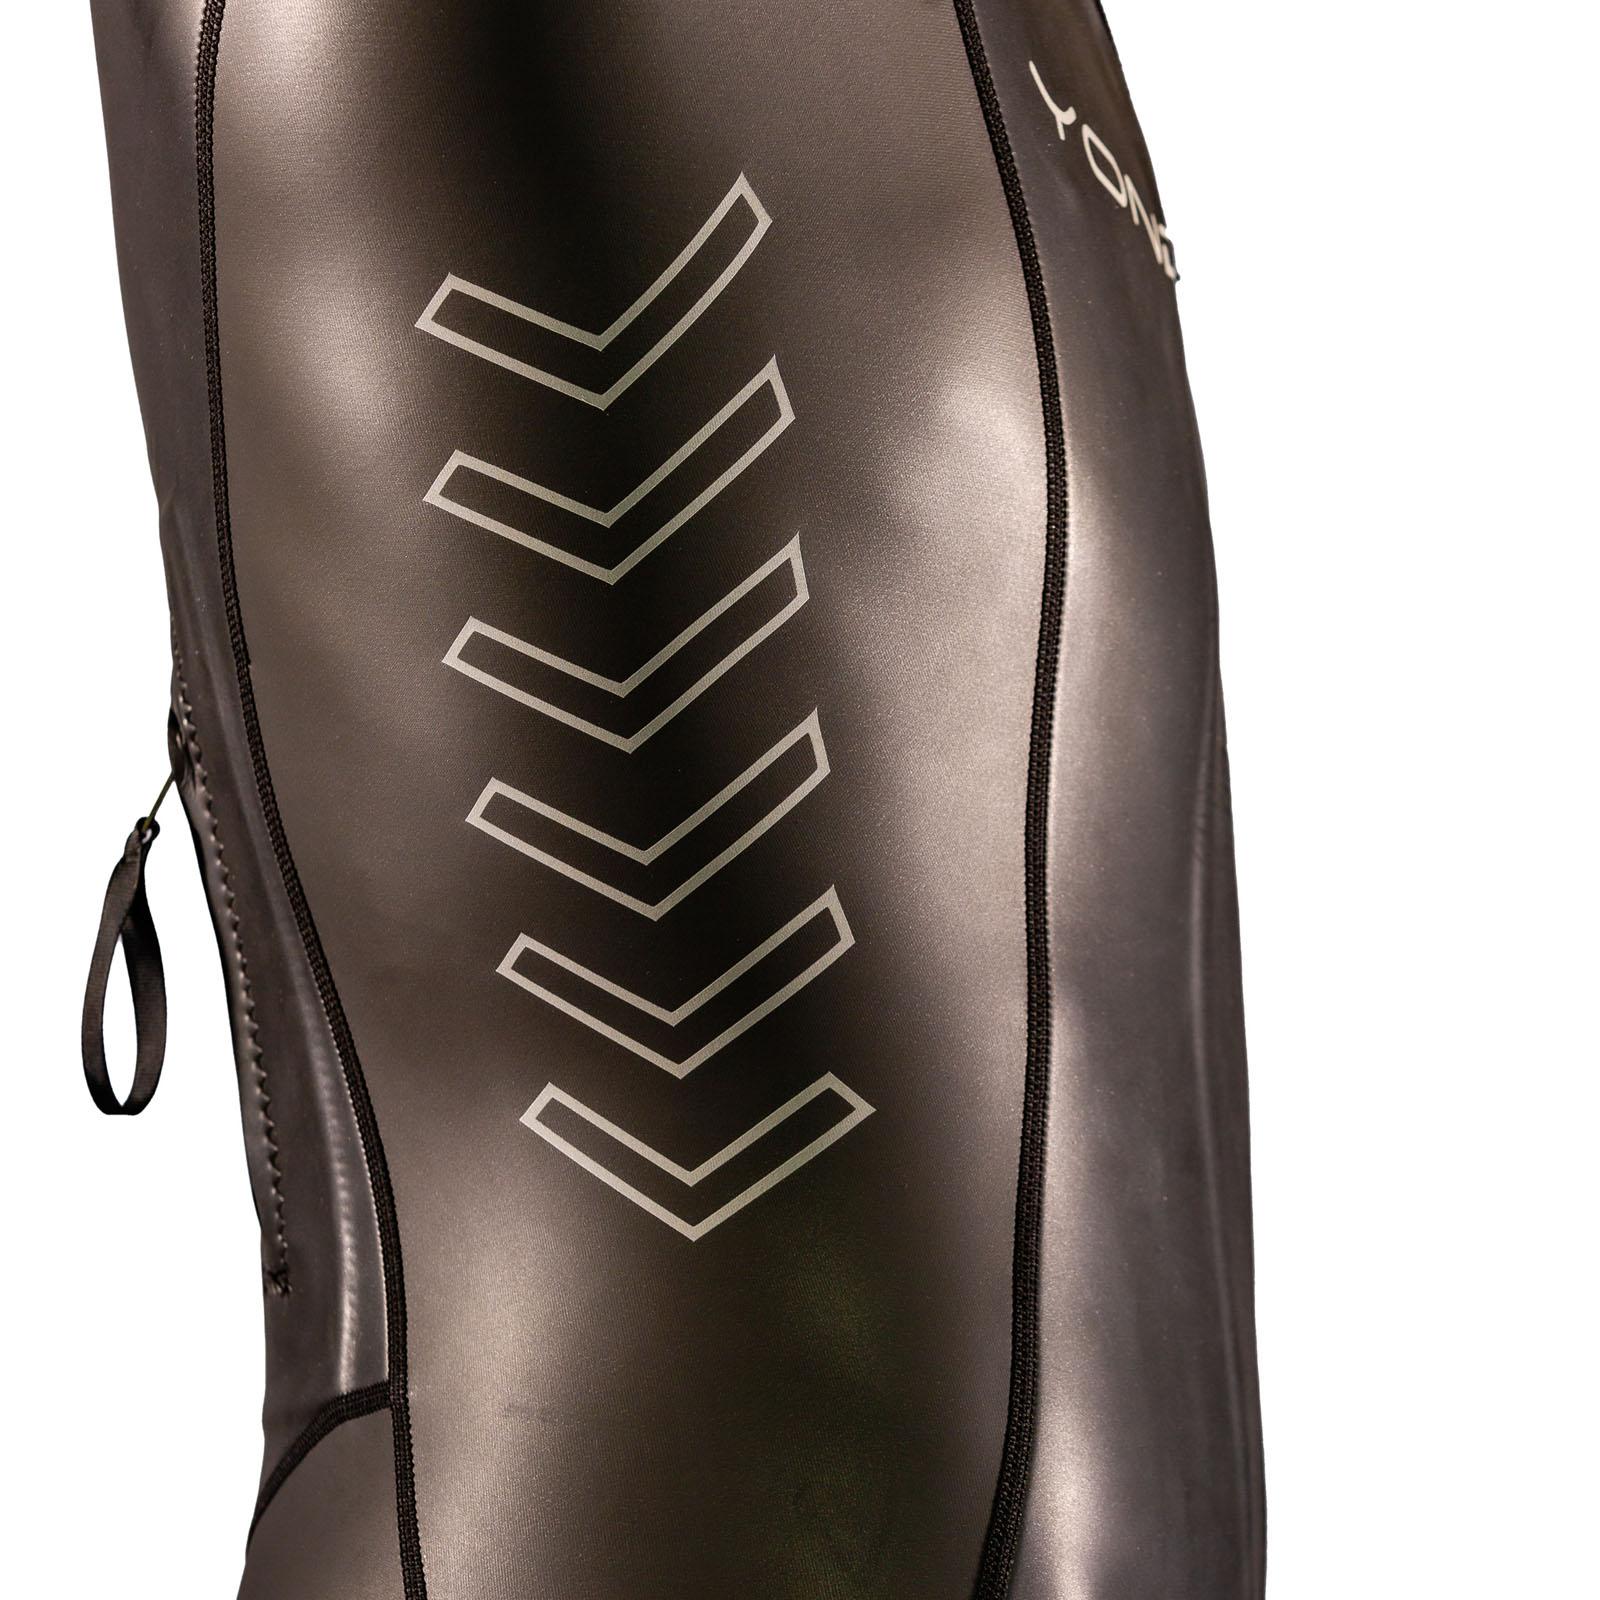 Yonda Spook Swim Run - Men's Wetsuit